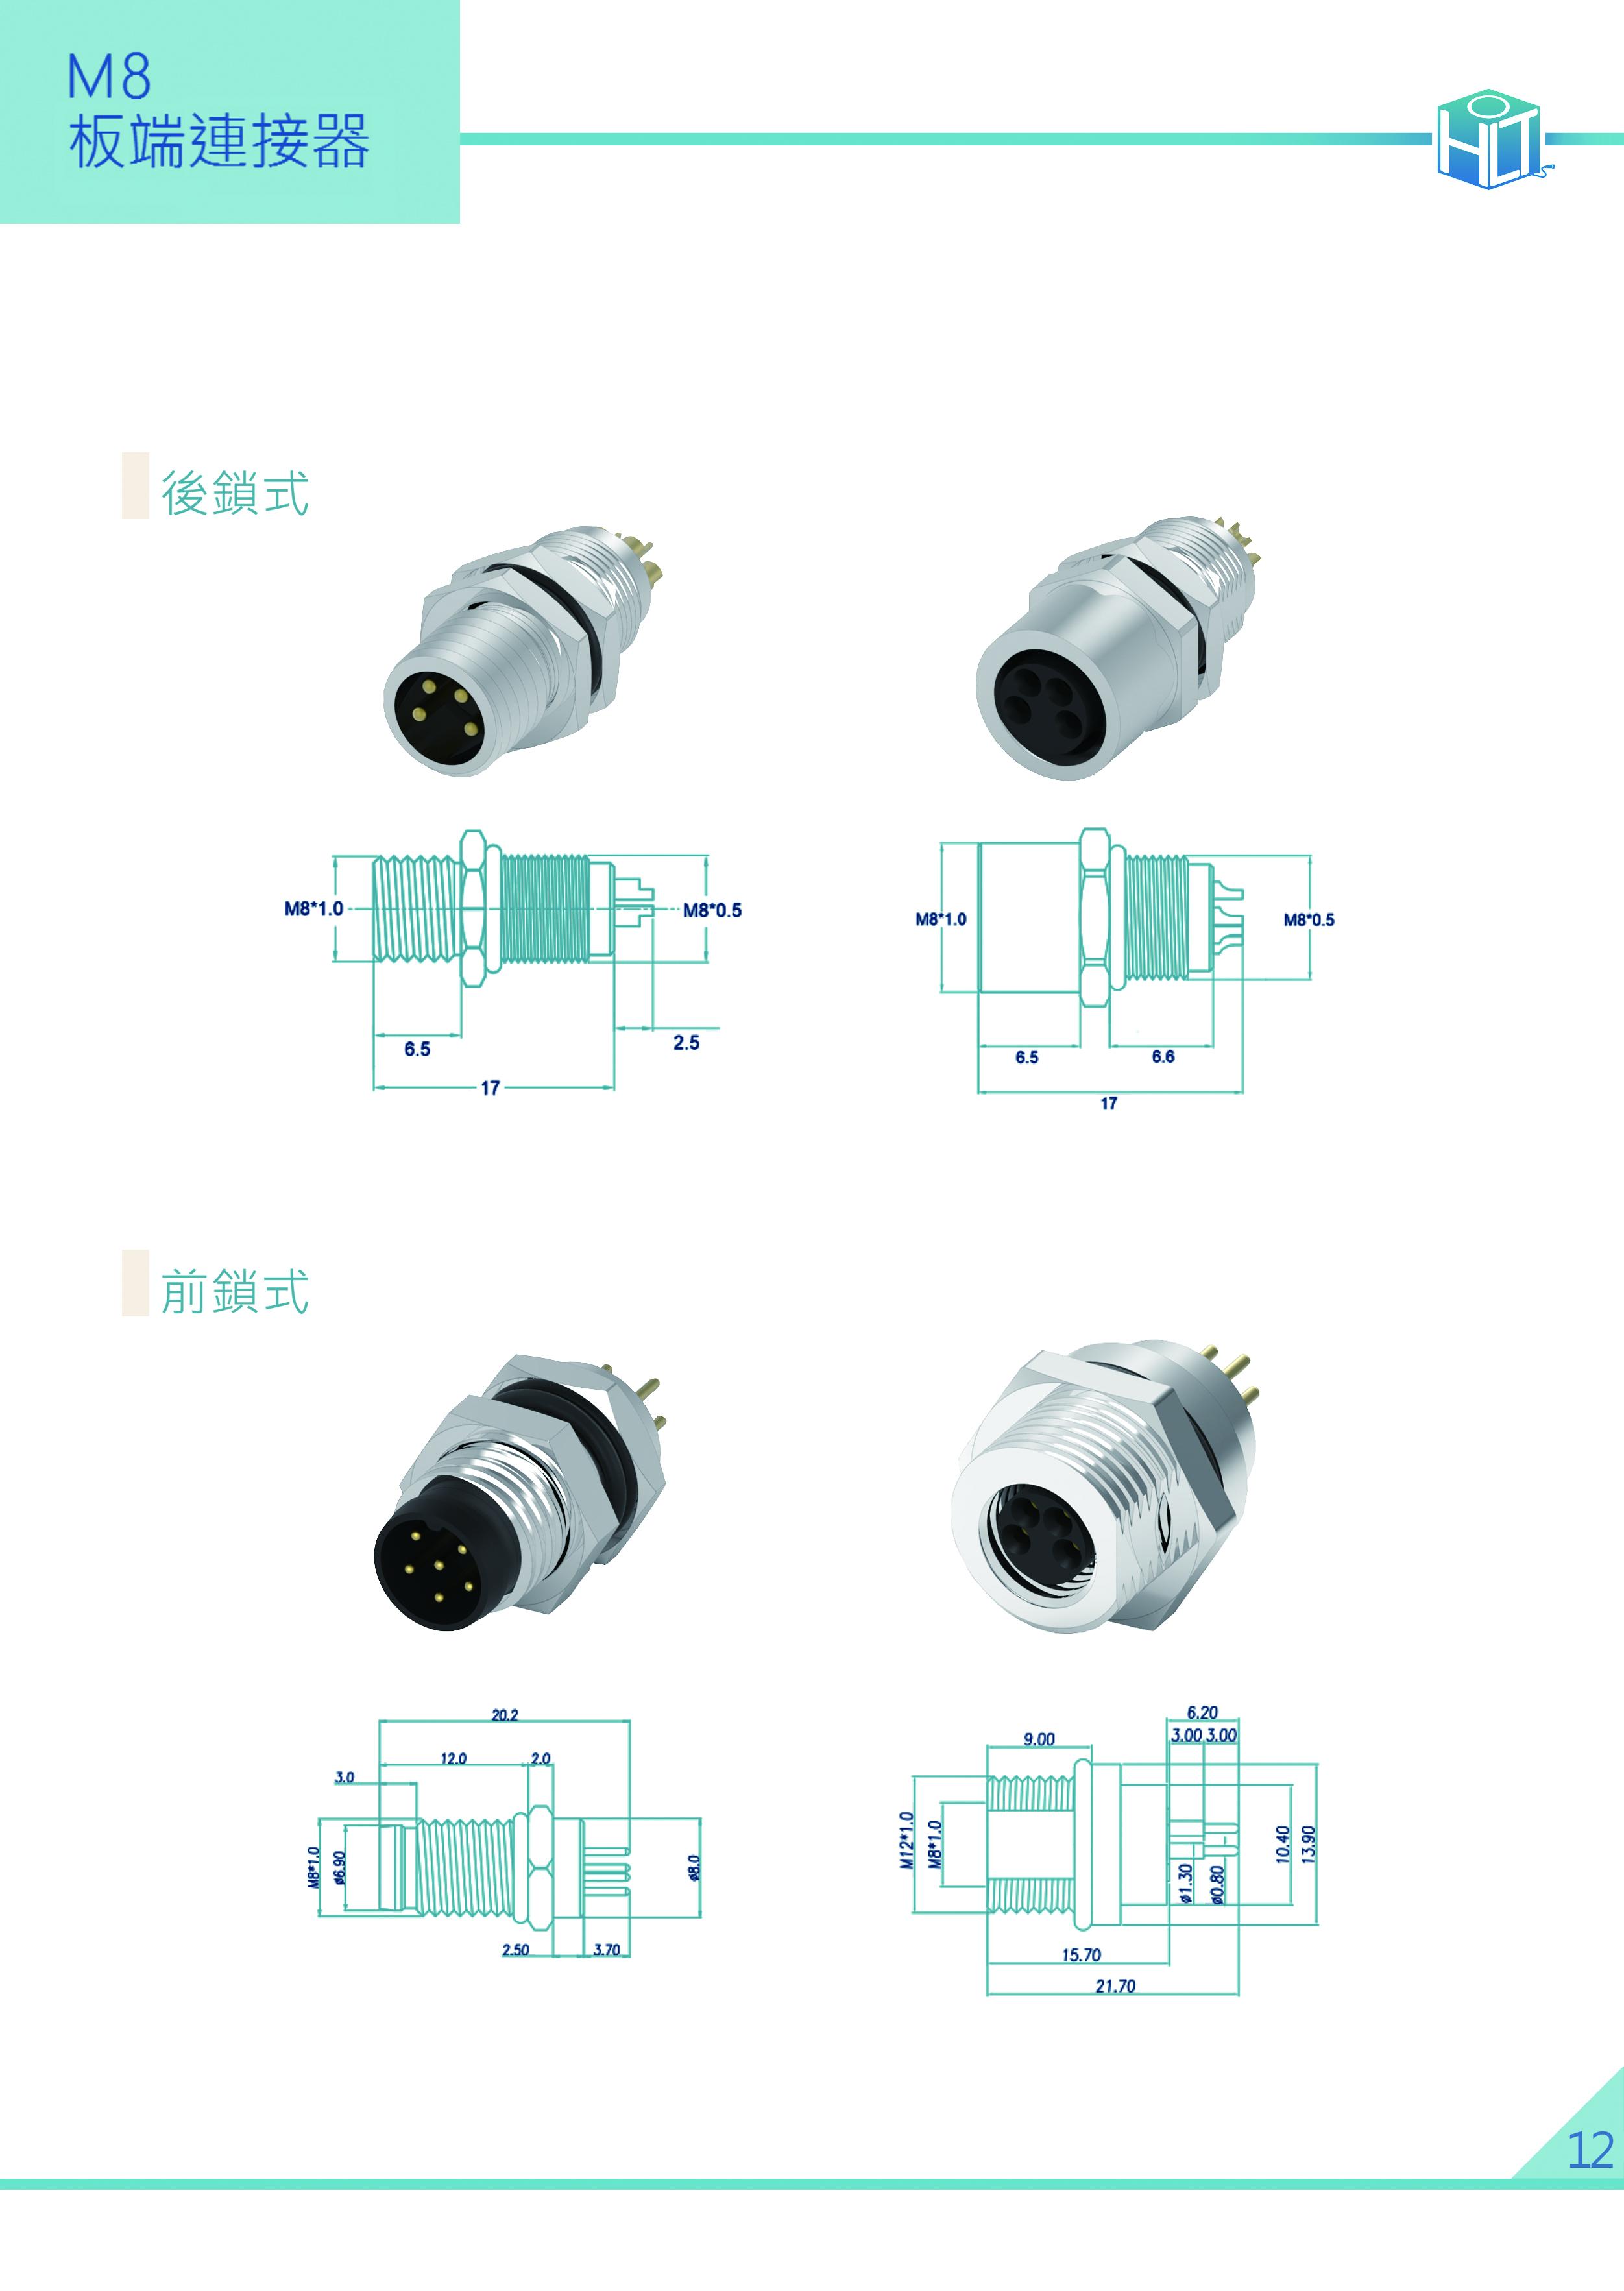 M8 防水連接器(板端) - 弘凌科技股份有限公司